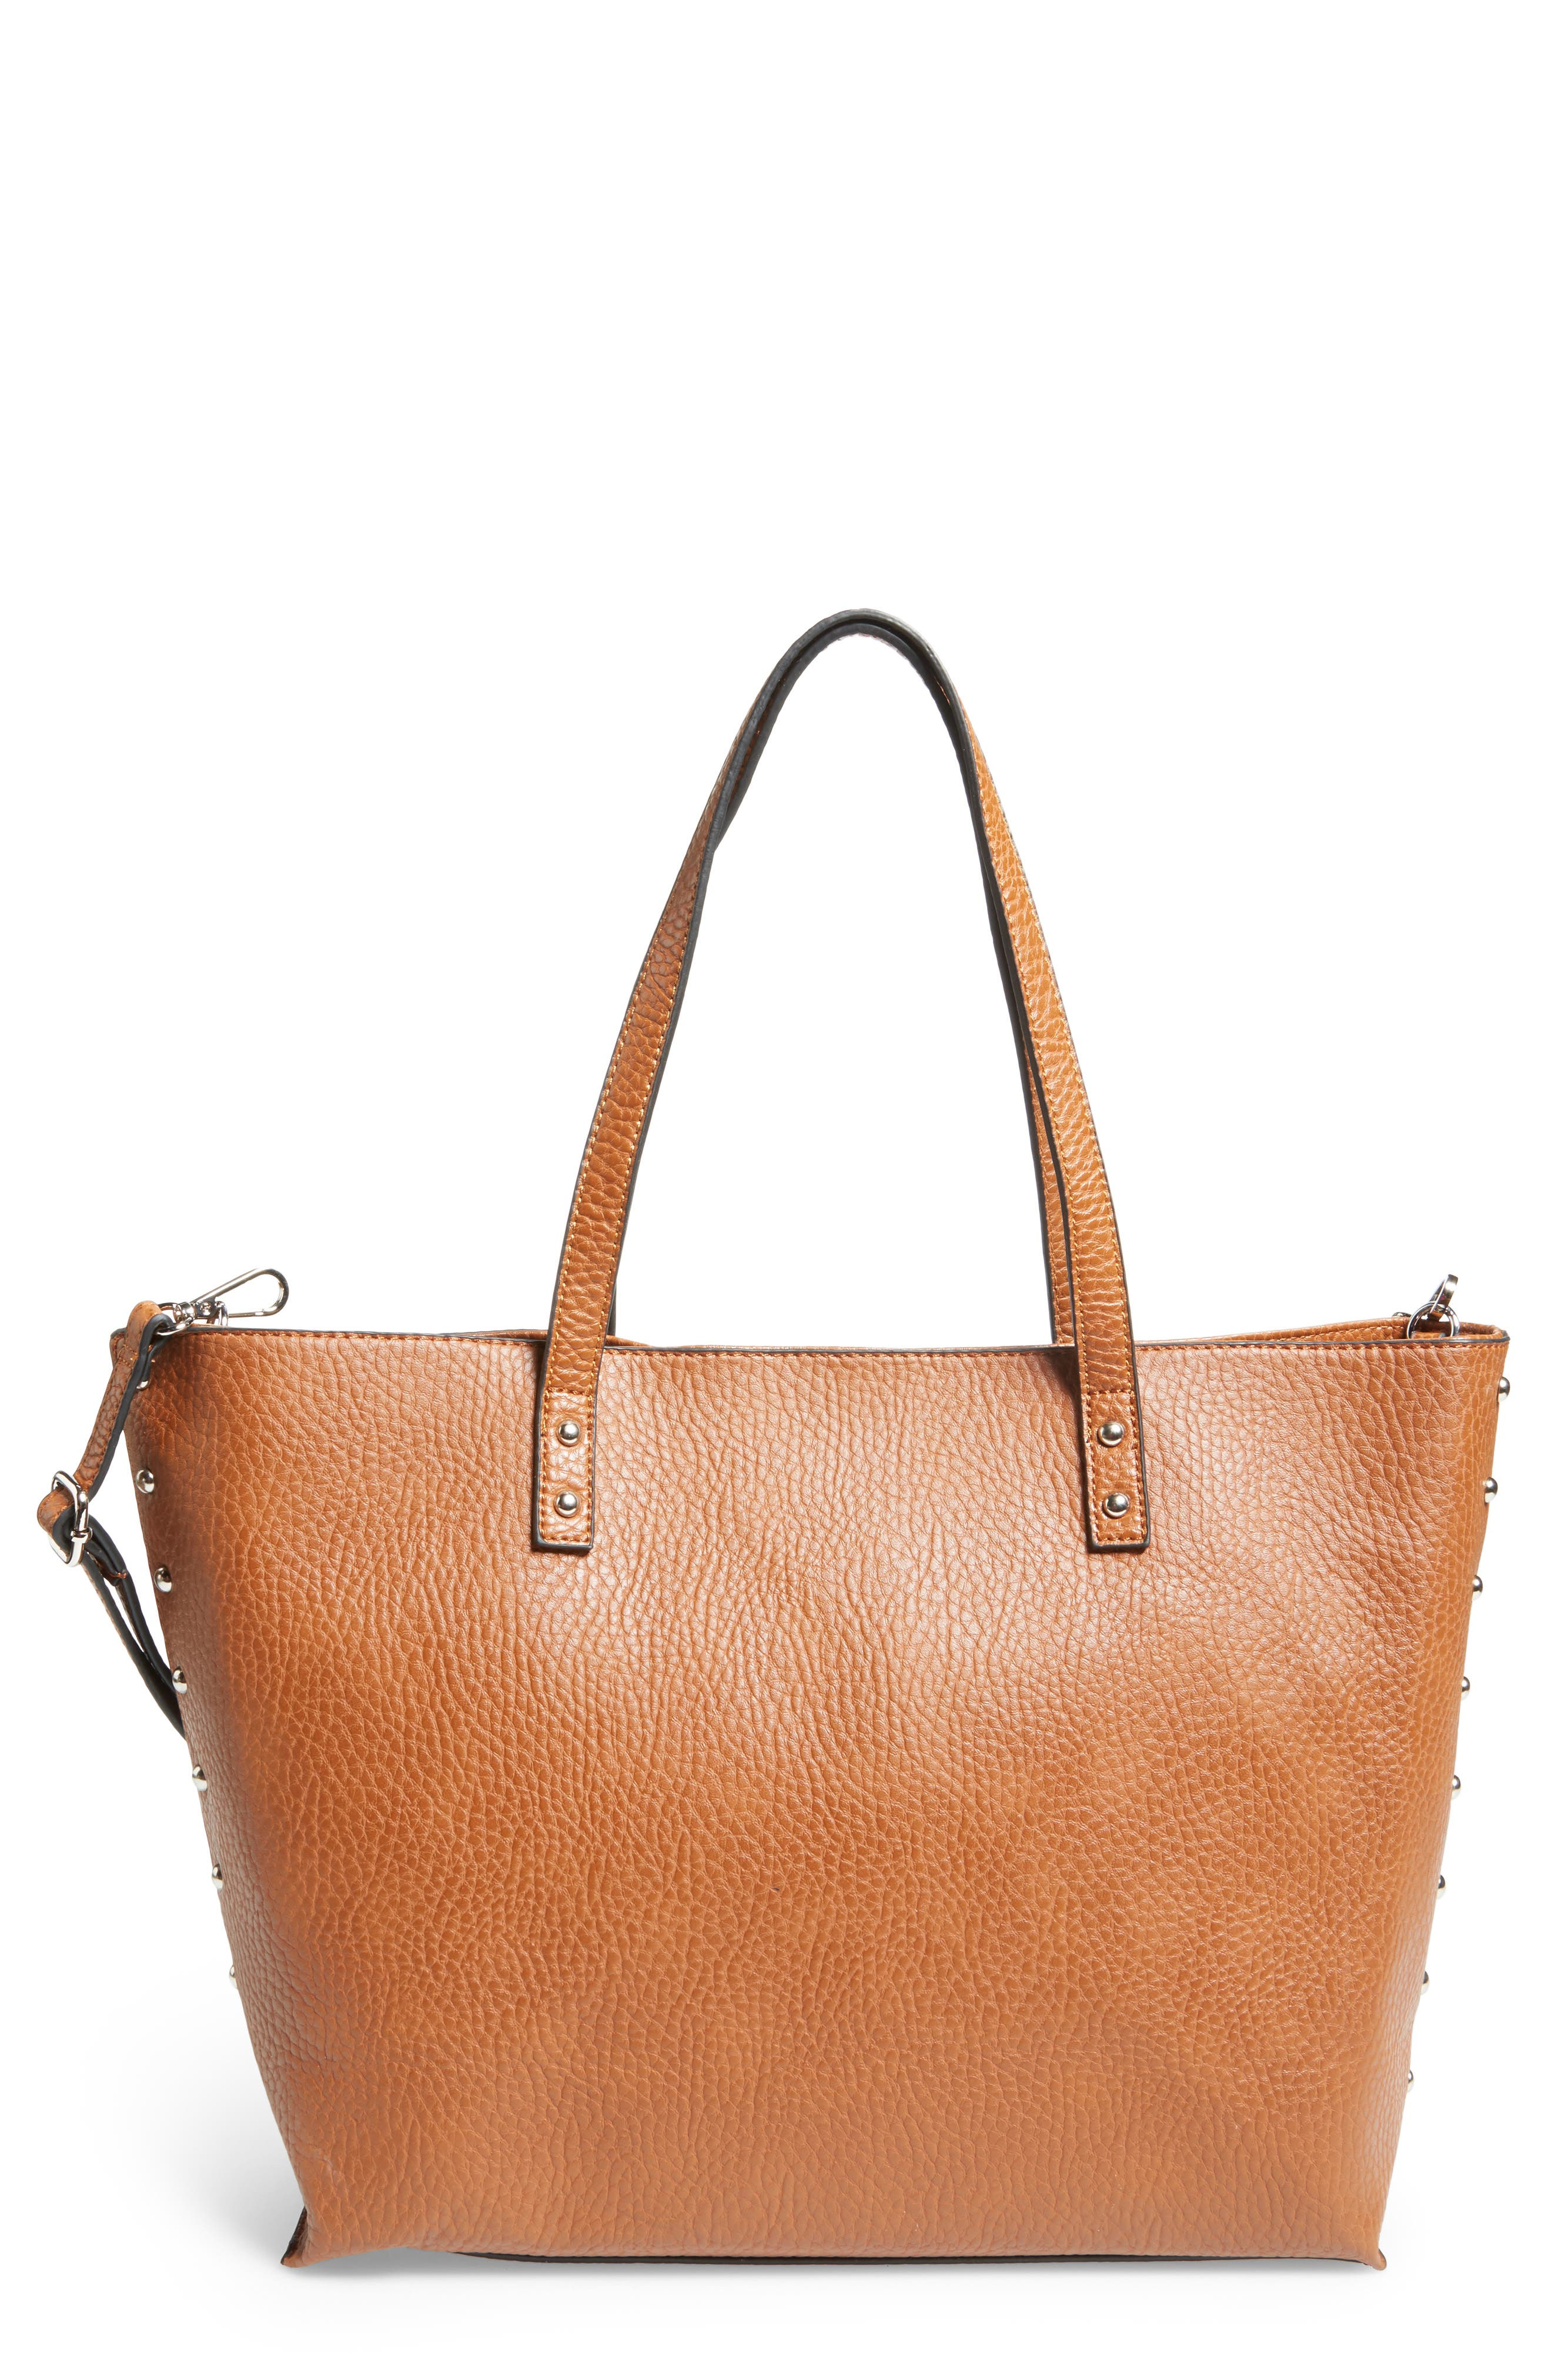 Linea Pelle Faux Leather Tote